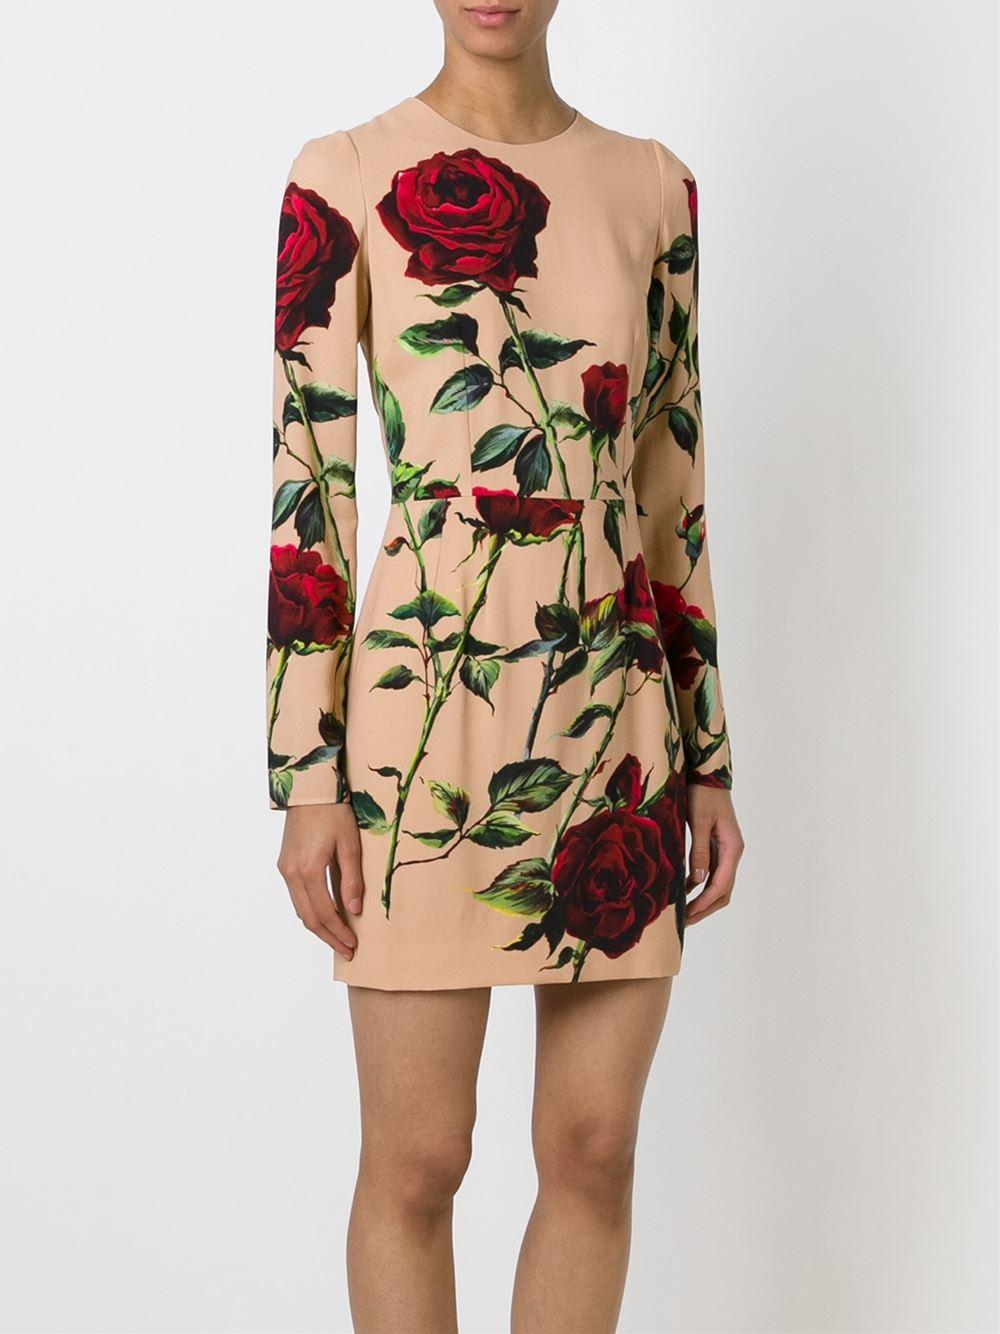 Lyst - Dolce & gabbana Rose Print Dress